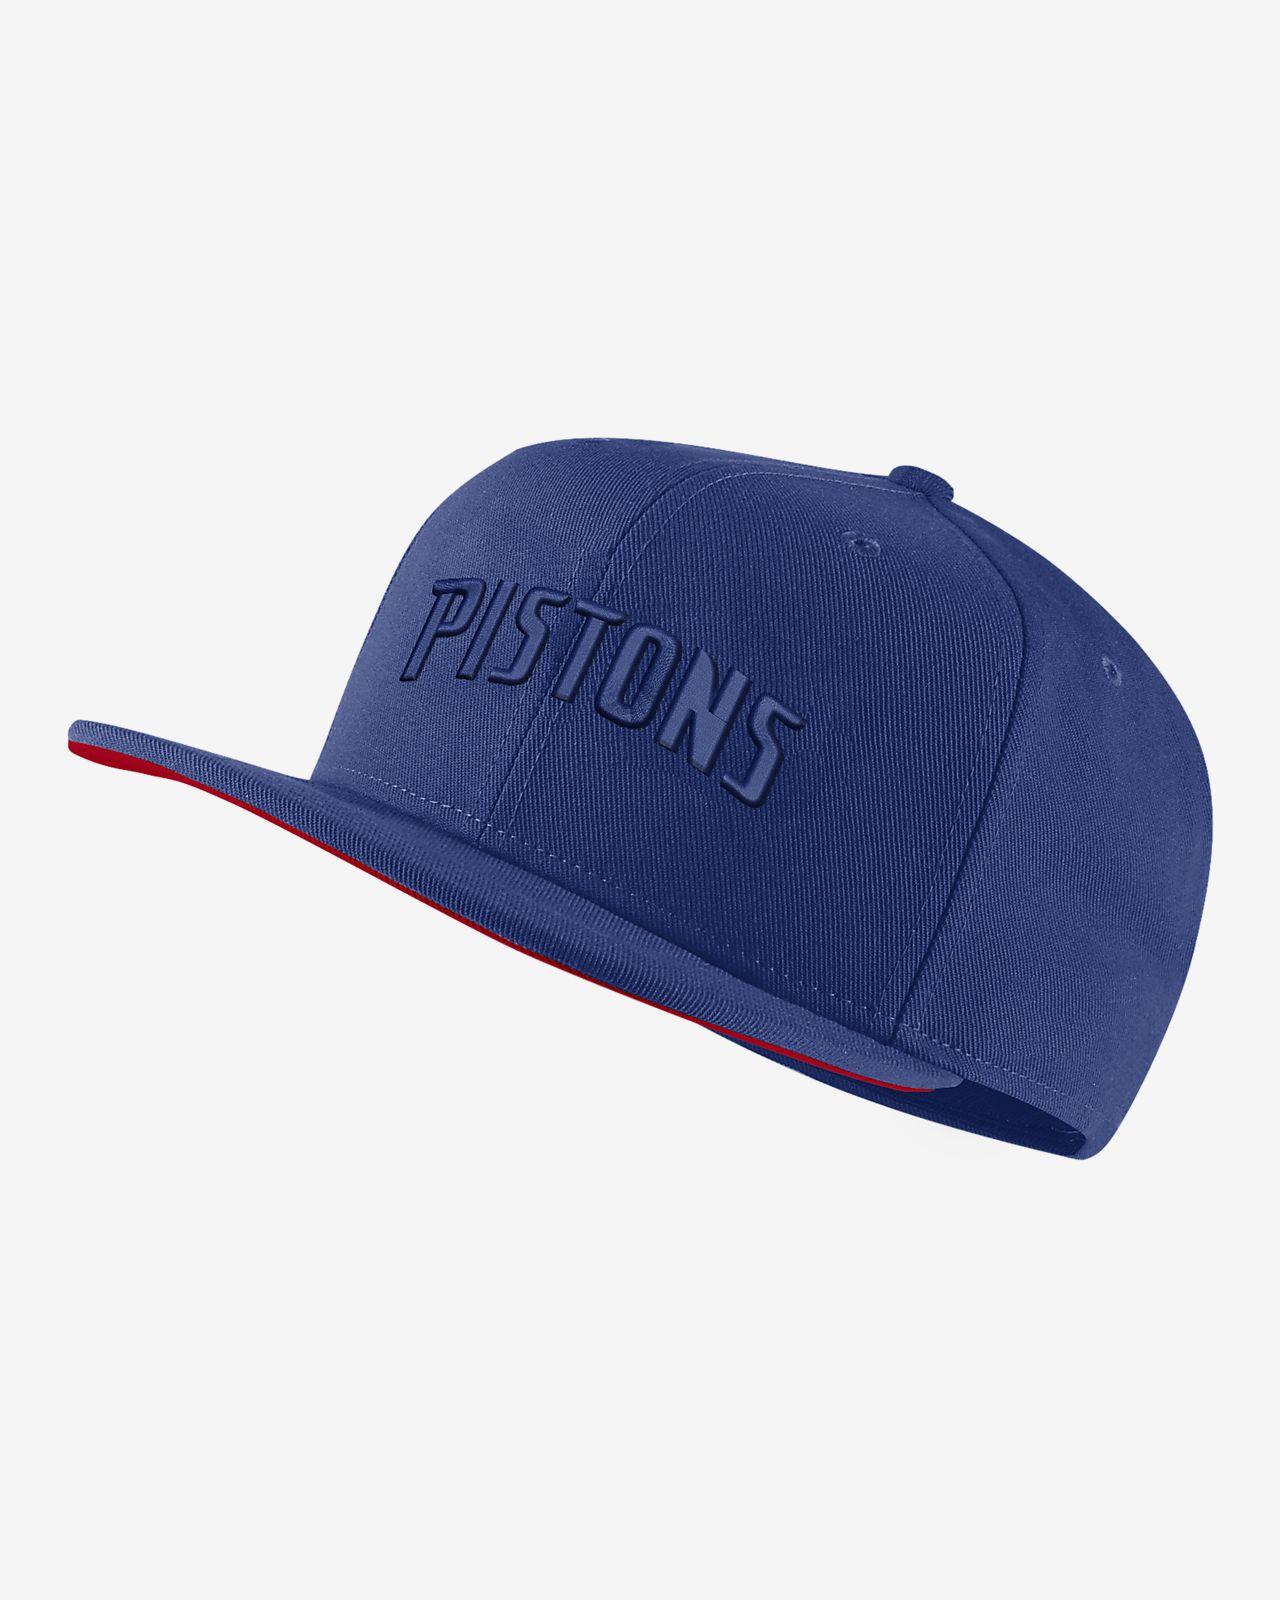 NBA-keps Detroit Pistons Nike AeroBill